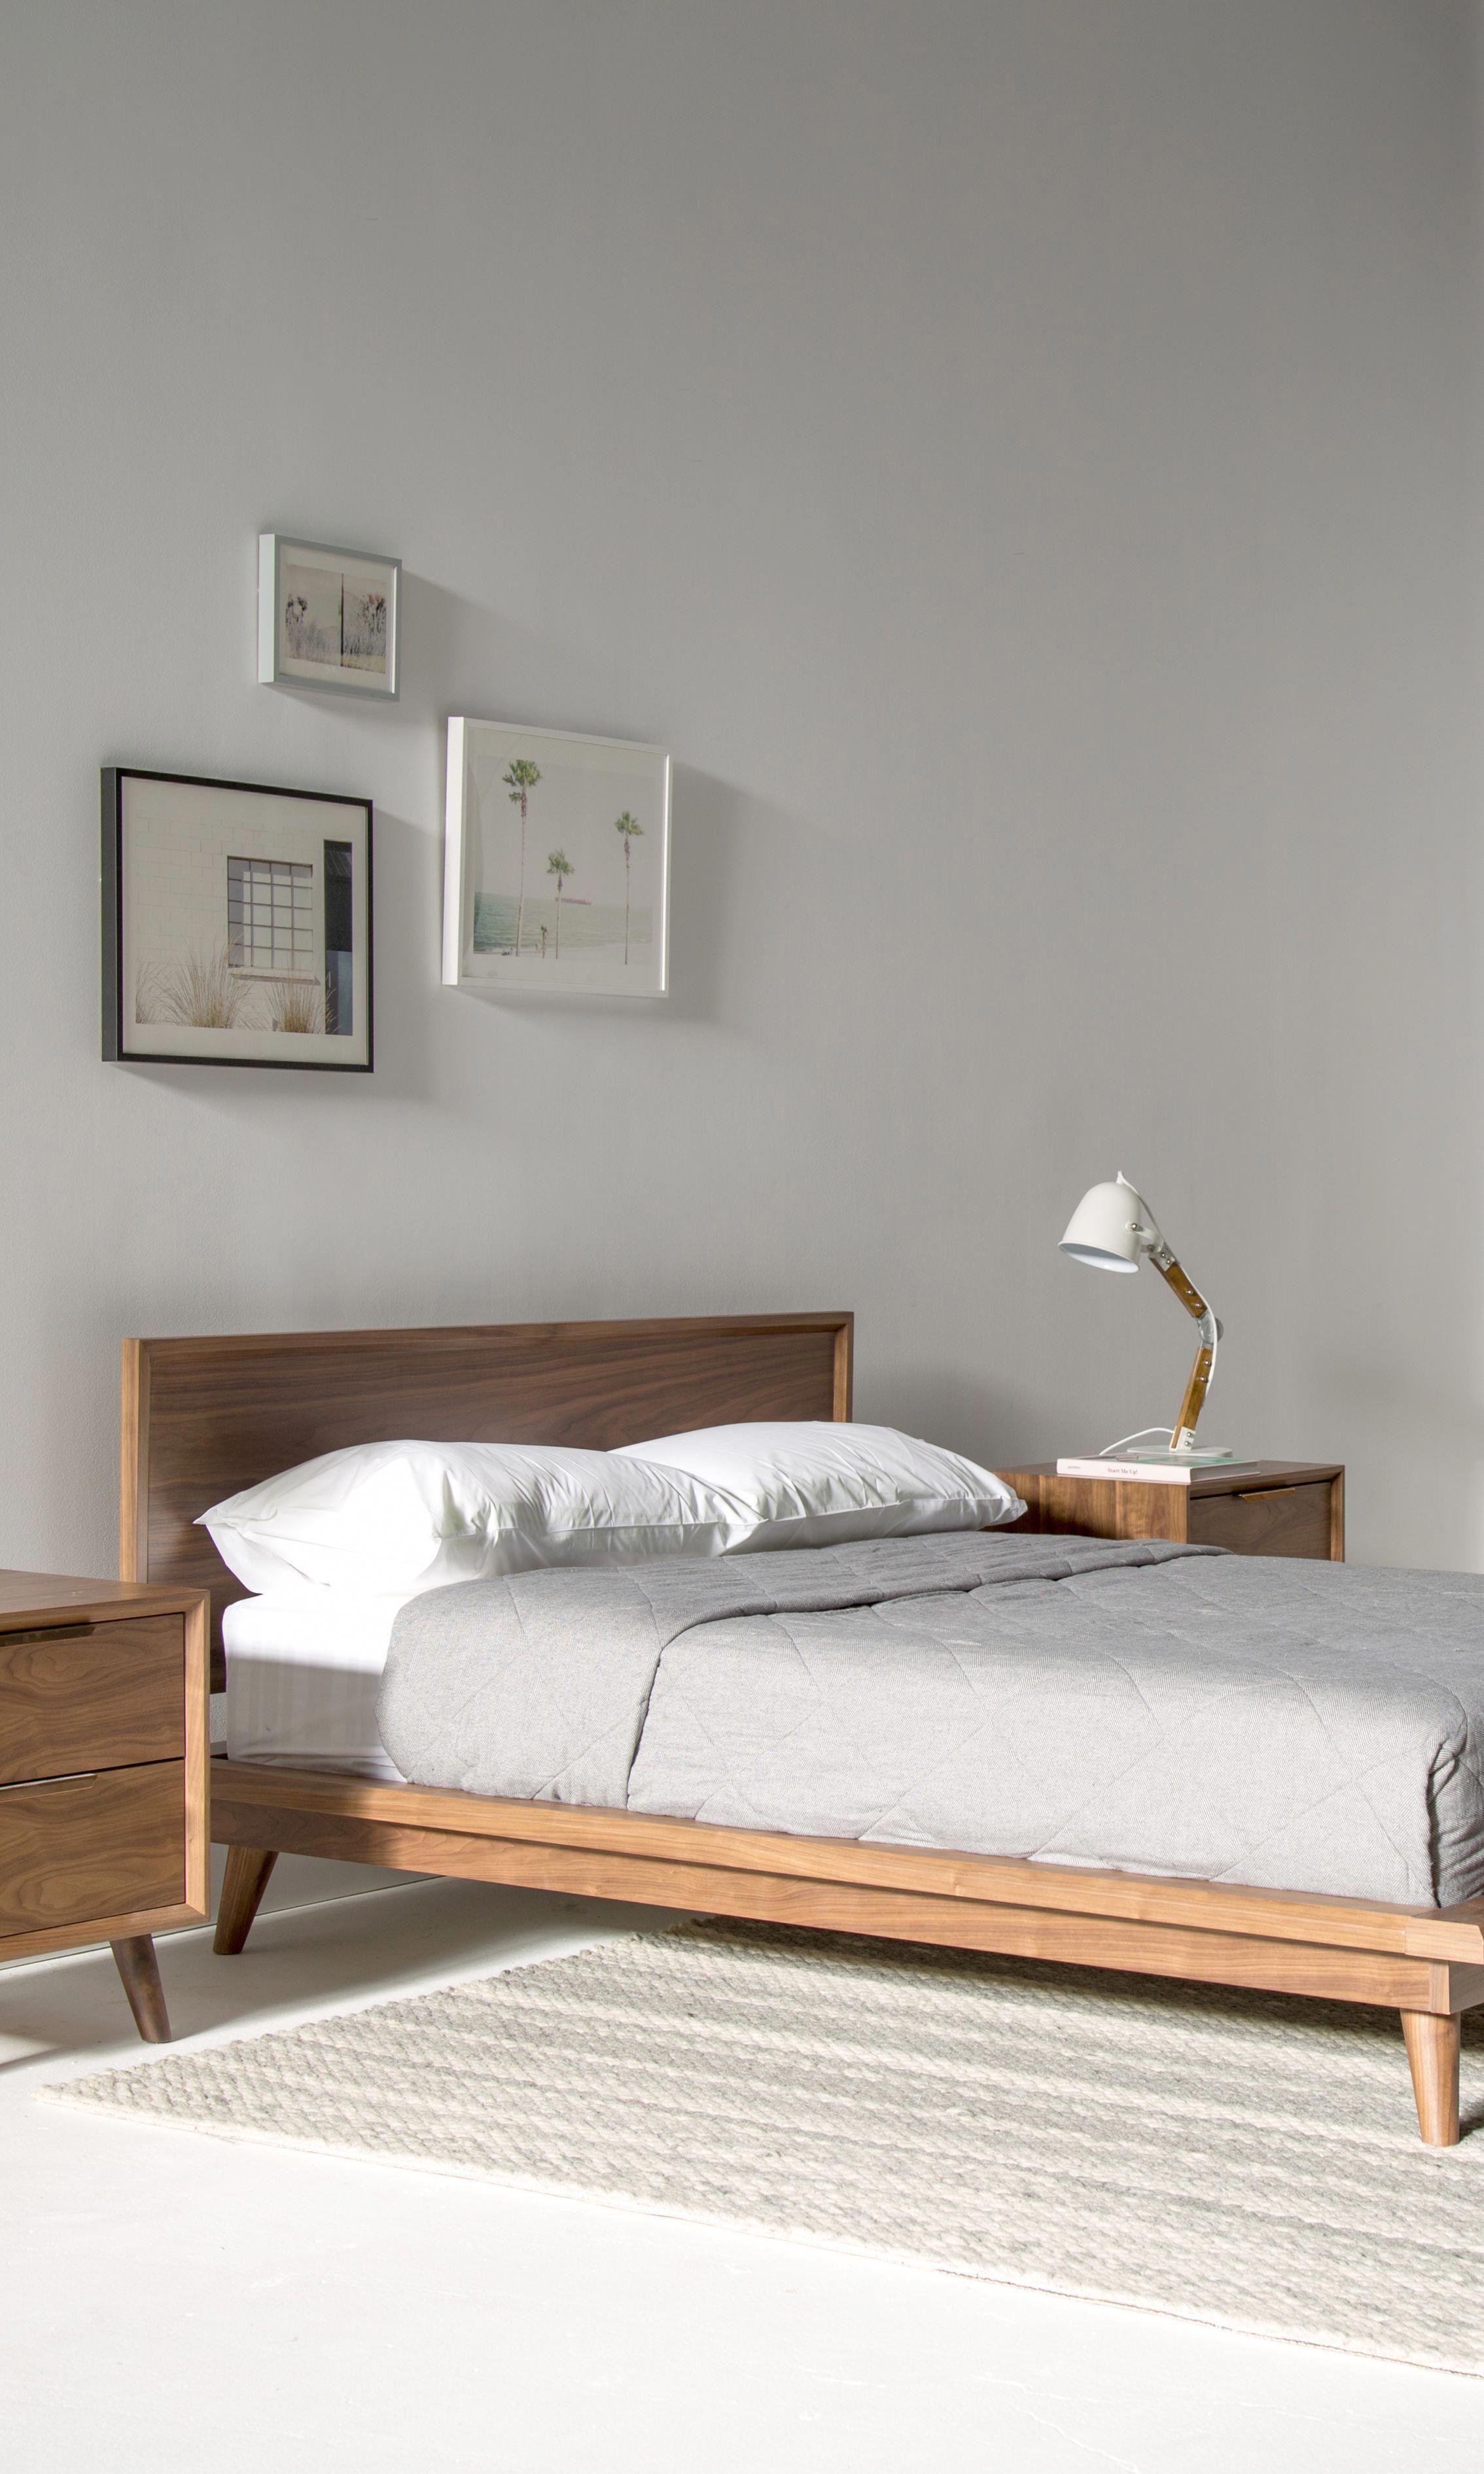 Mr Price Home Bedroom Decor Ideas Homedecorbedroom Minimalist